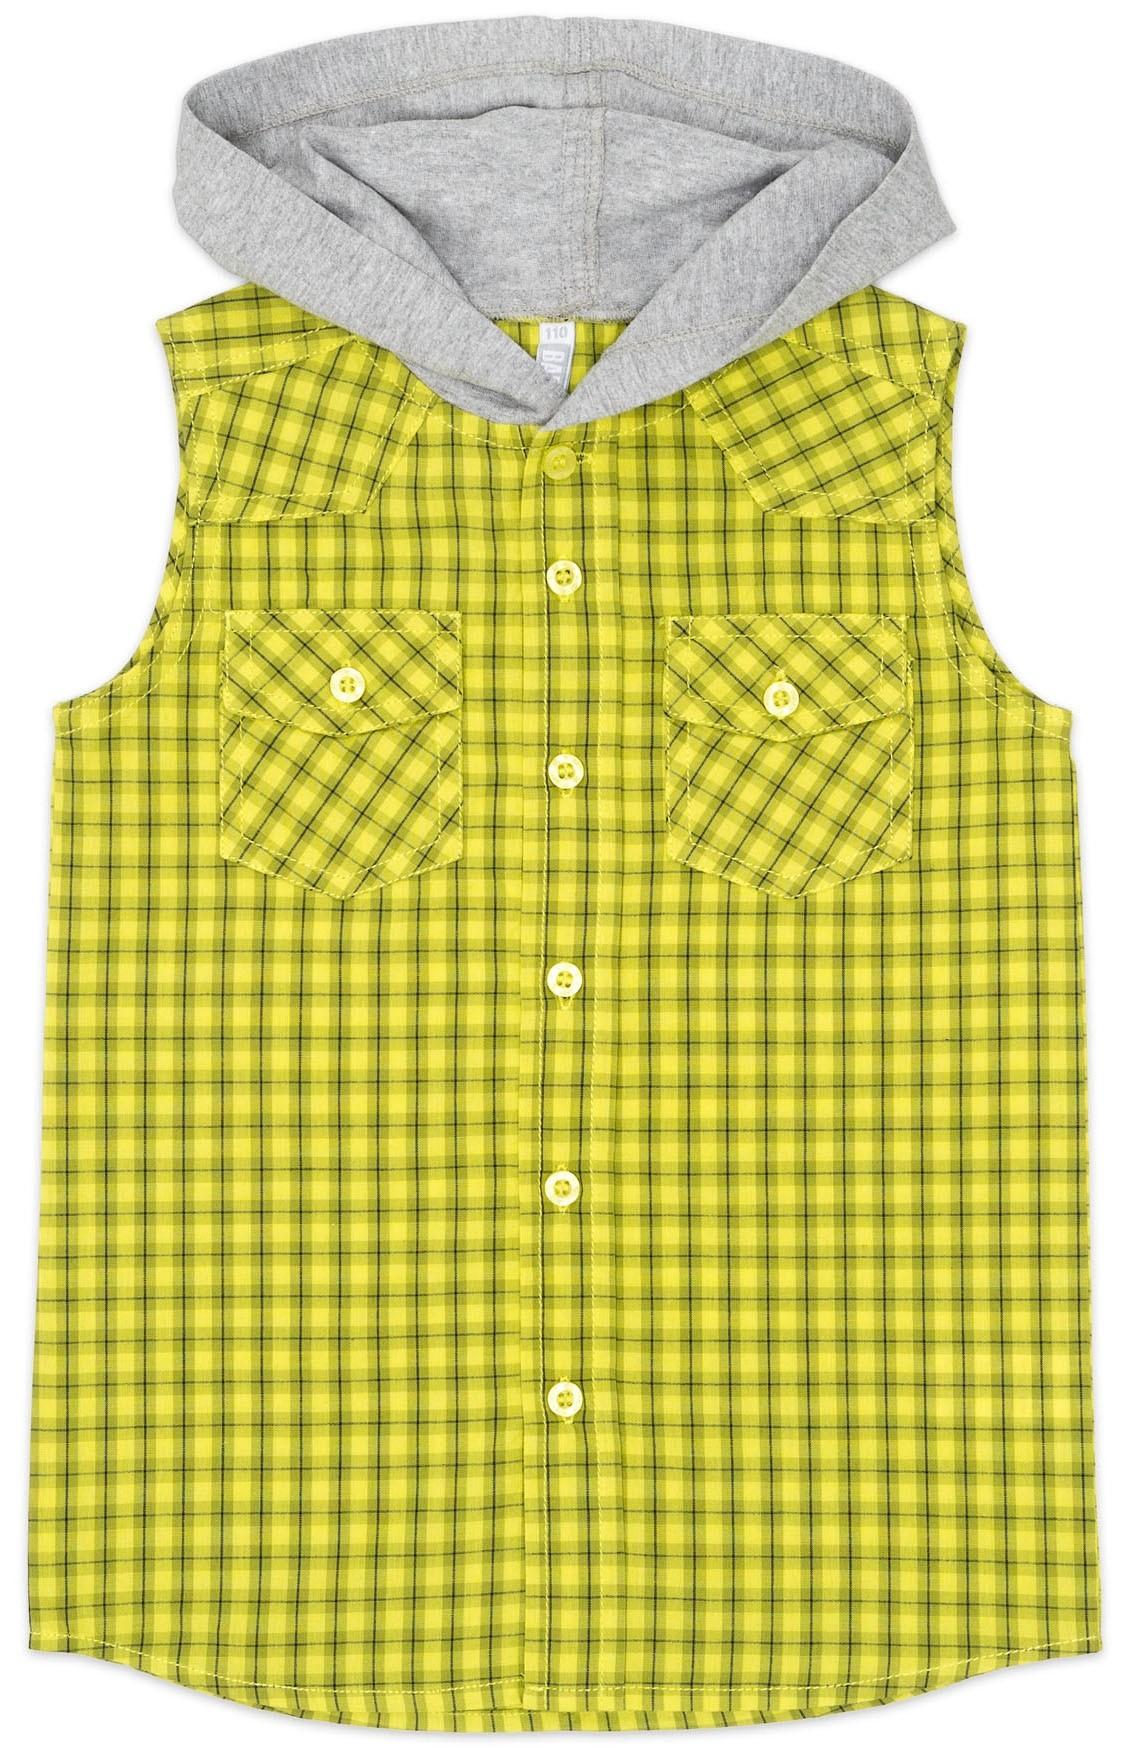 Рубашки Barkito Сорочка без рукавов с капюшоном для мальчика Barkito, Лови волну, салатовая брюки barkito салатовая